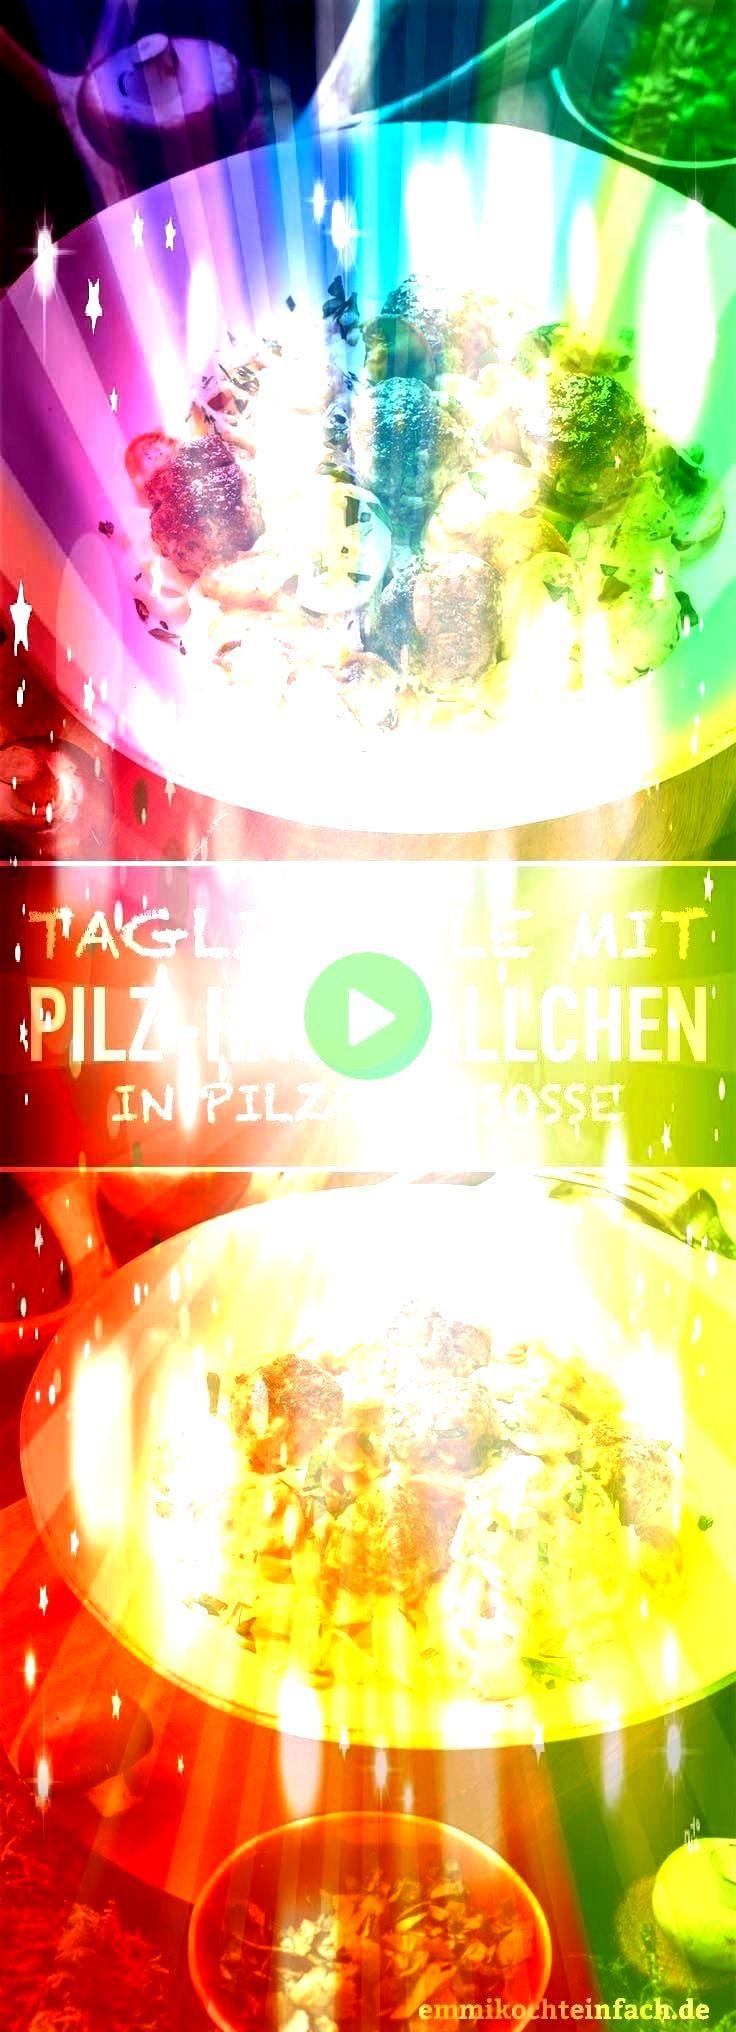 in Pilzrahmsoße  wwwemmikochteinf Tagliatelle mit PilzHackbällchen in Pilzrahmsoße  wwwemmikochteinf  This Creamy Garlic Herb Mushroom Spaghetti is total...